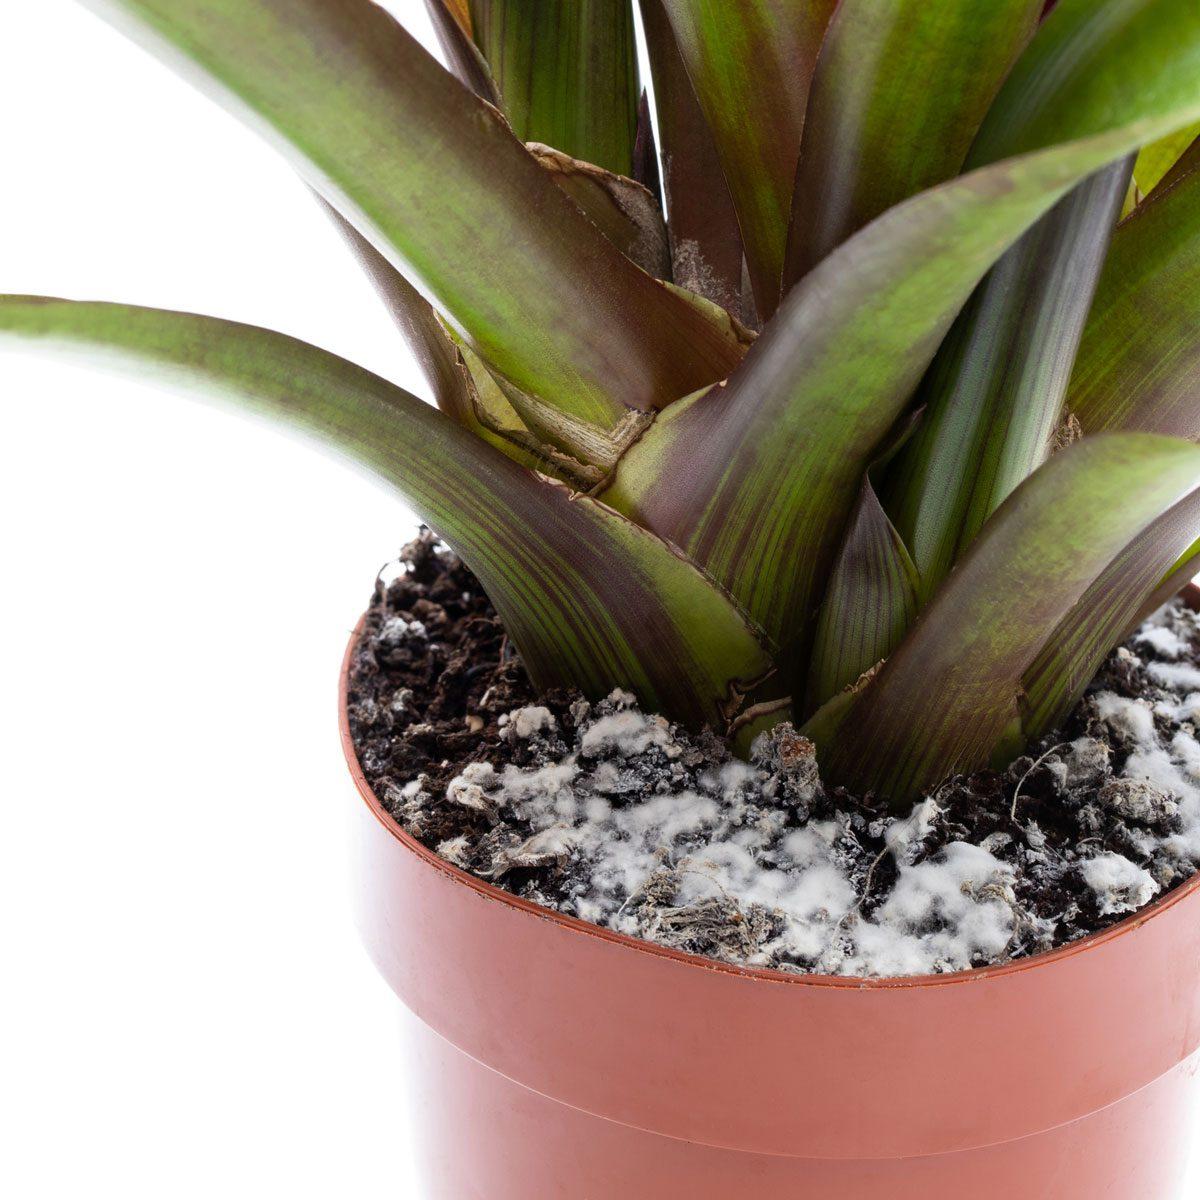 Mold on plant soil